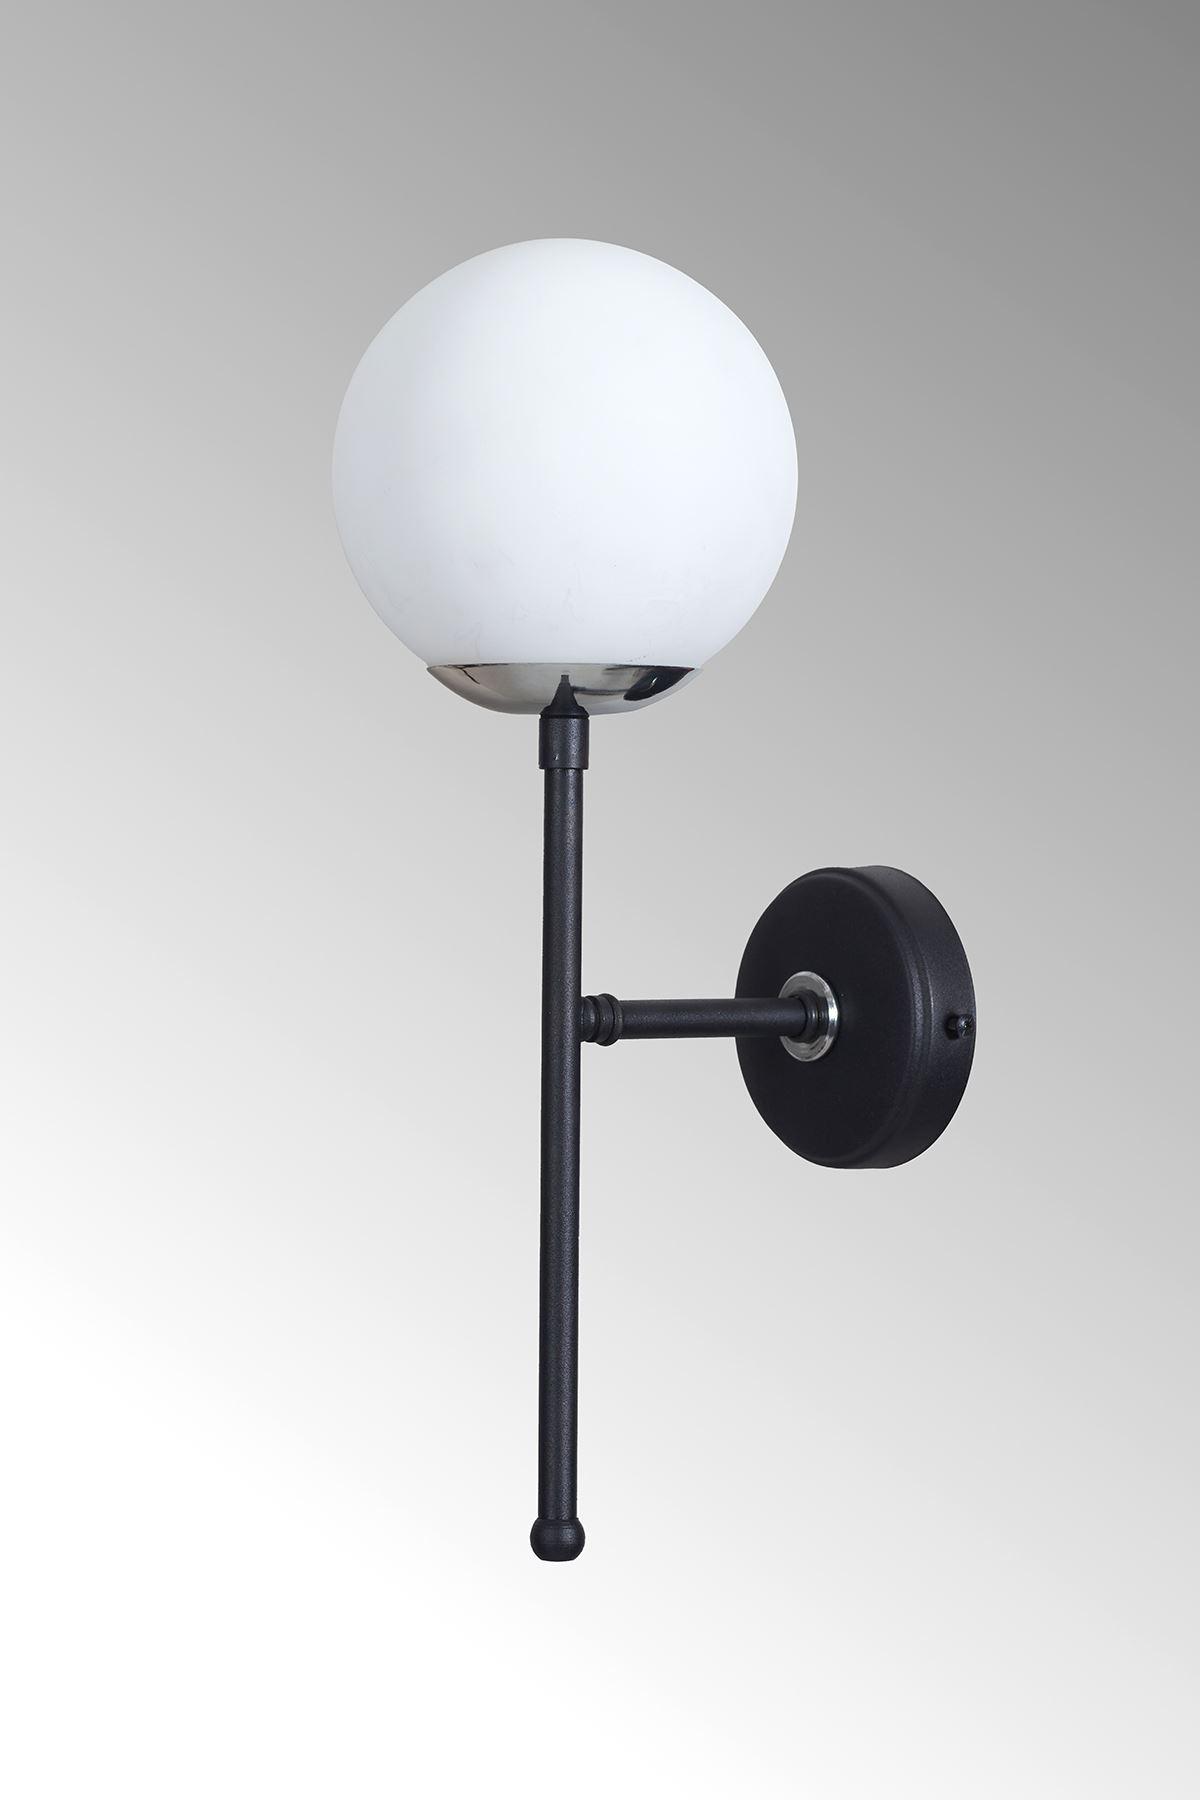 Olimpo Krom-Siyah Metal Gövde Beyaz Camlı Tasarım Lüx Aplik